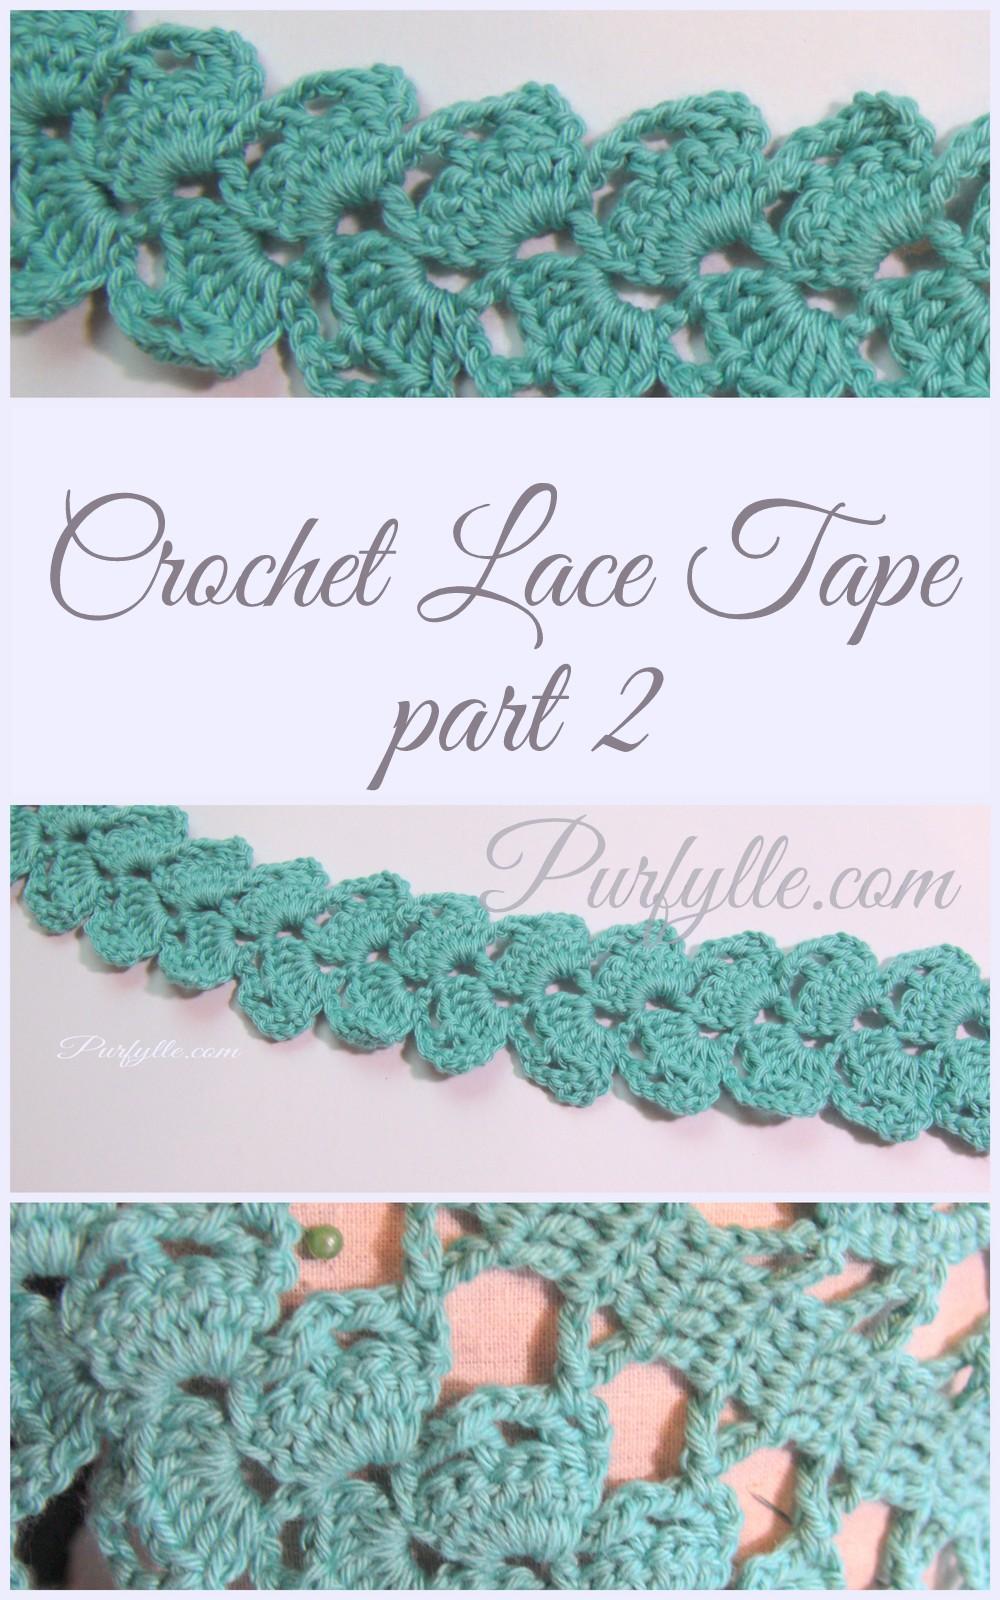 Purfylle crochet lace tape part 2 simple crochet lace tape bankloansurffo Image collections